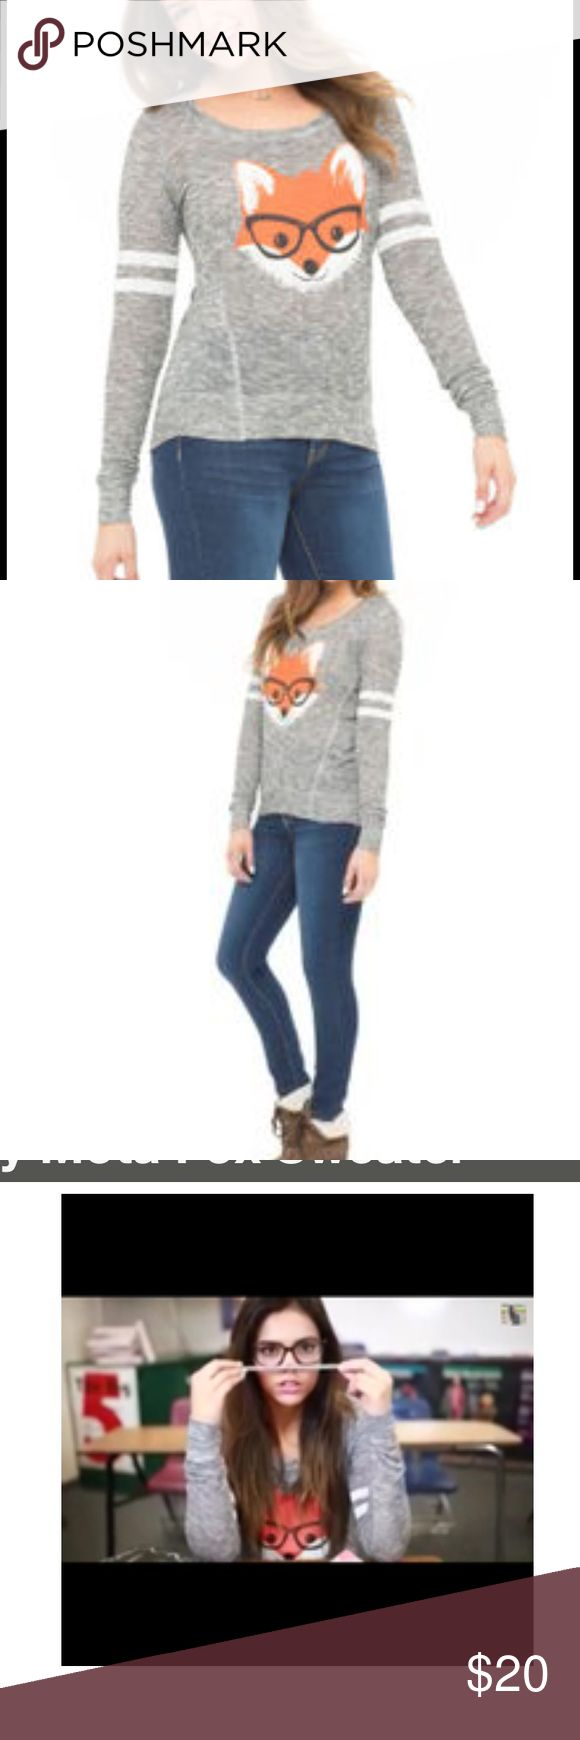 Bethany Mota fox top Smarty Fox Hi-Lo Sweater - Bethany Mota Collection. EUC size M Tops Tees - Long Sleeve